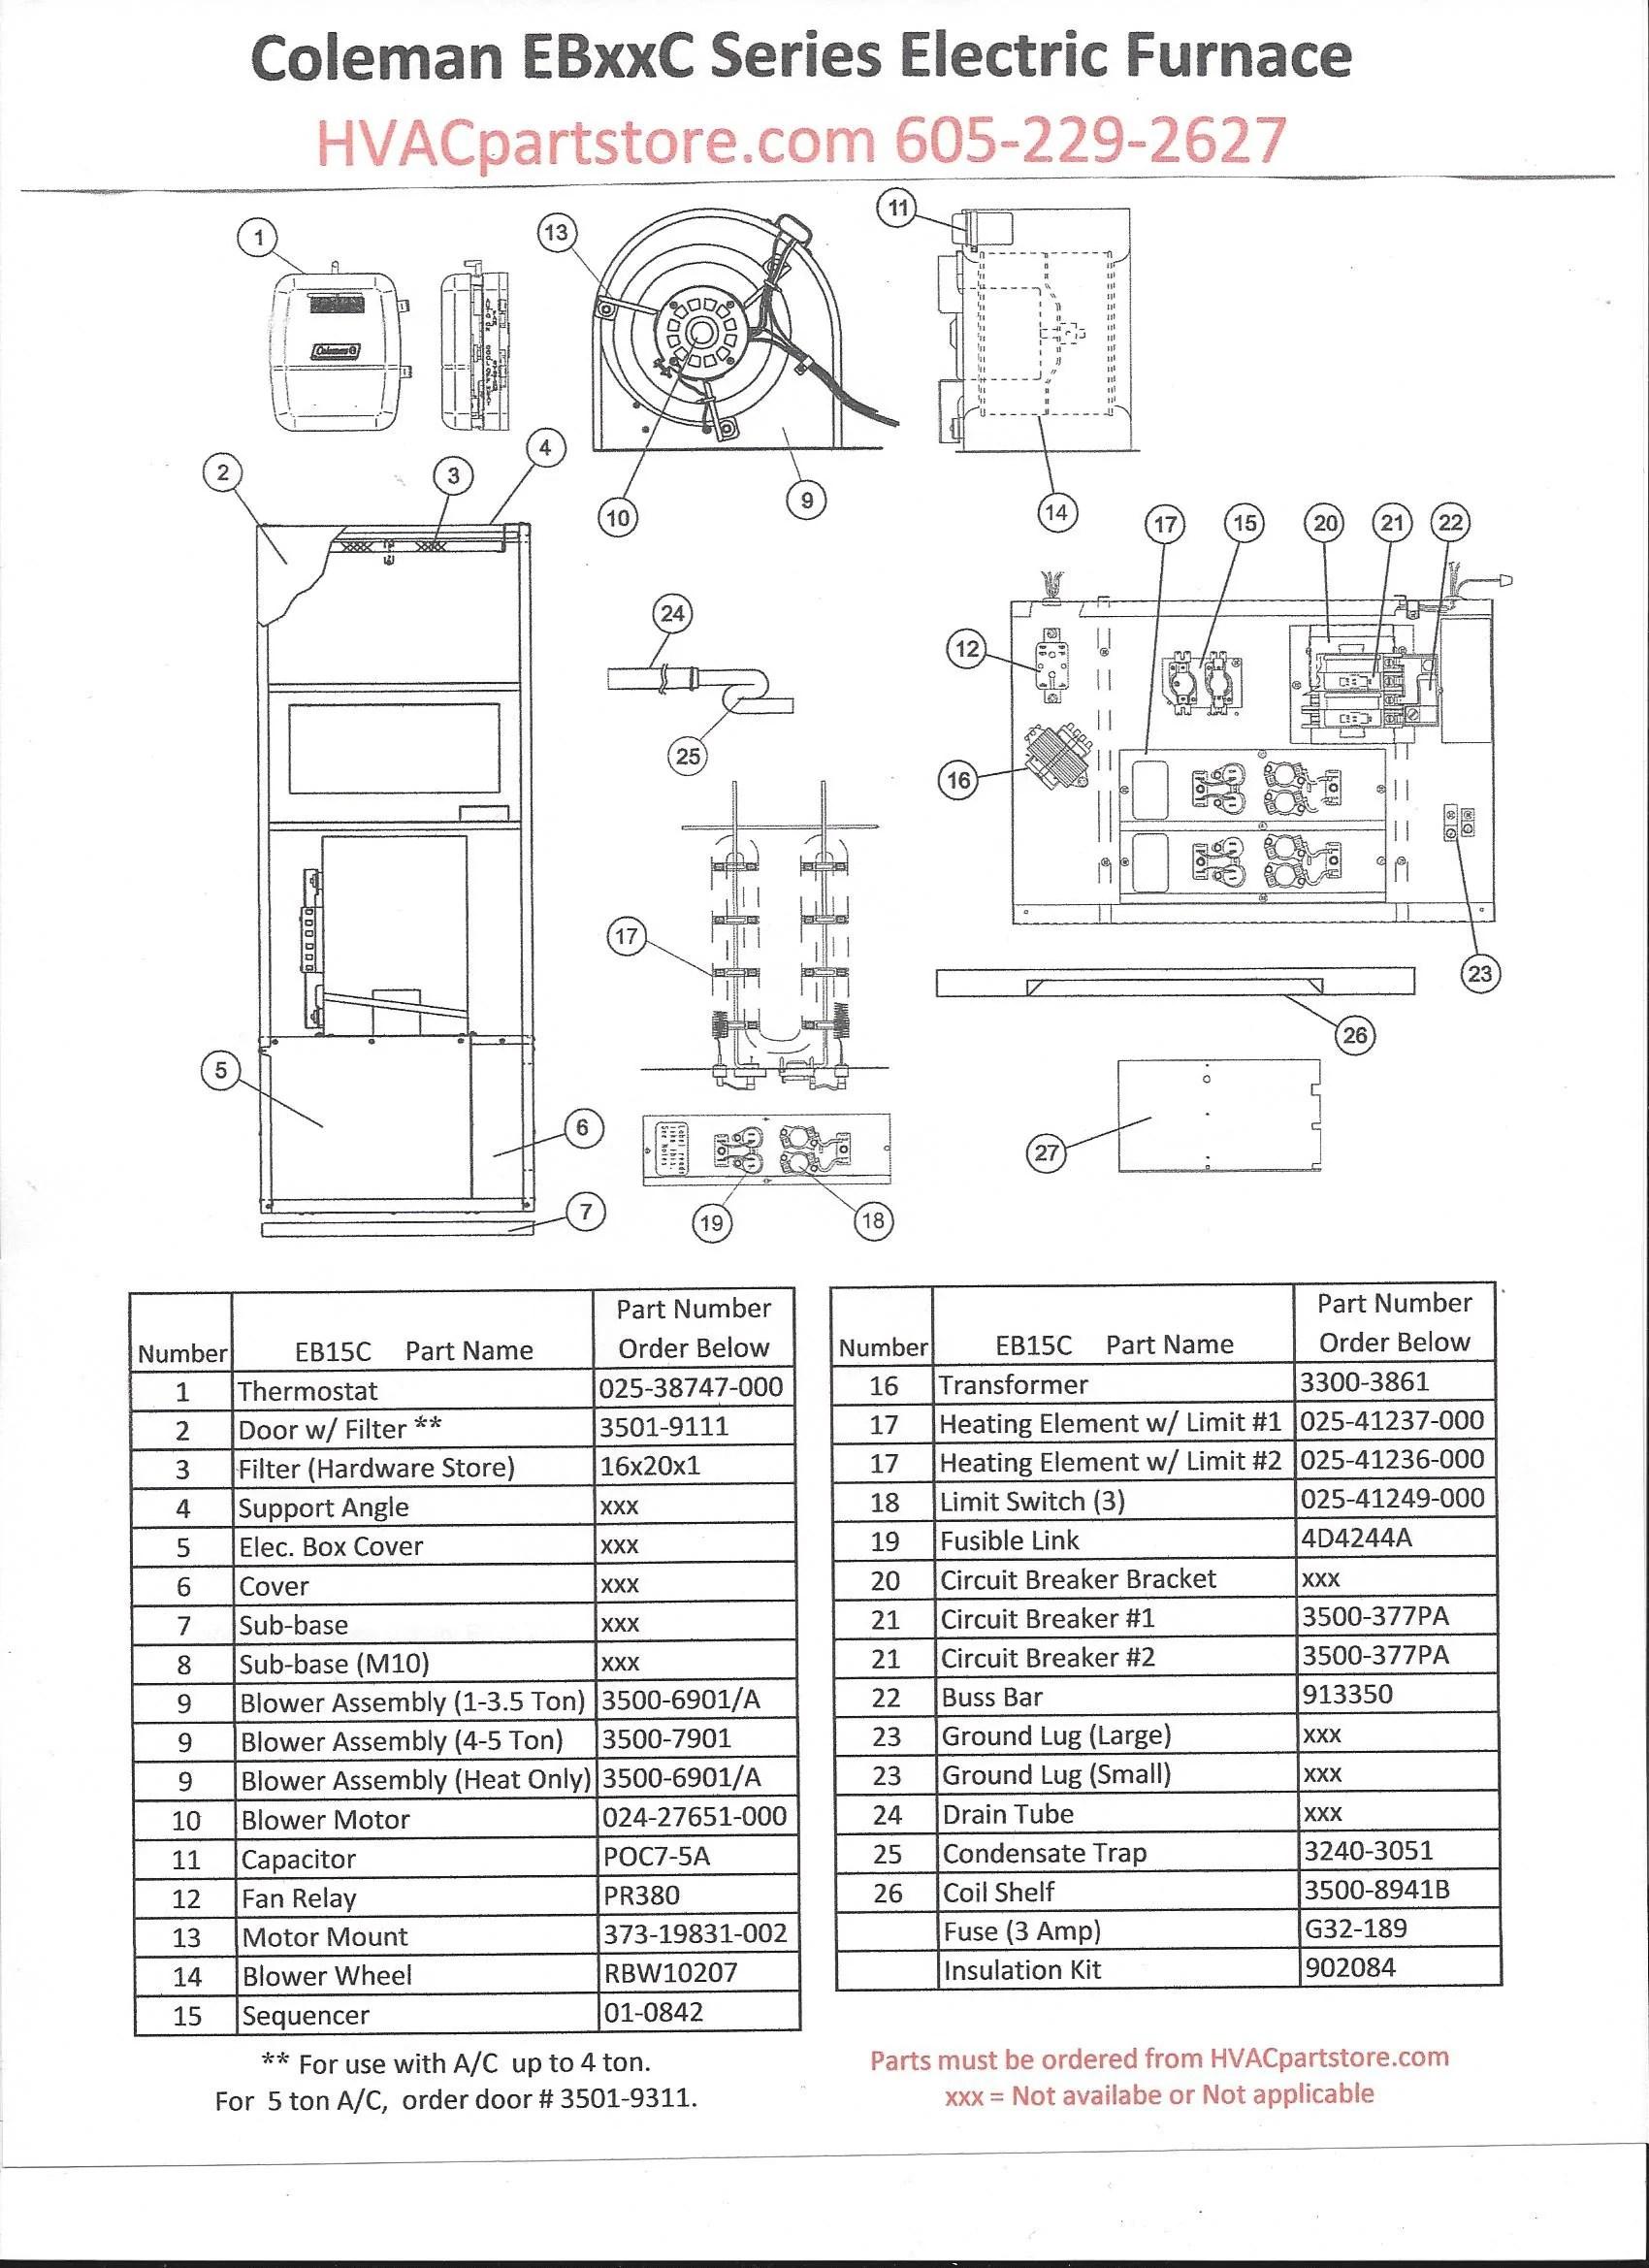 EB15C Coleman Electric Furnace Parts – HVACpartstore